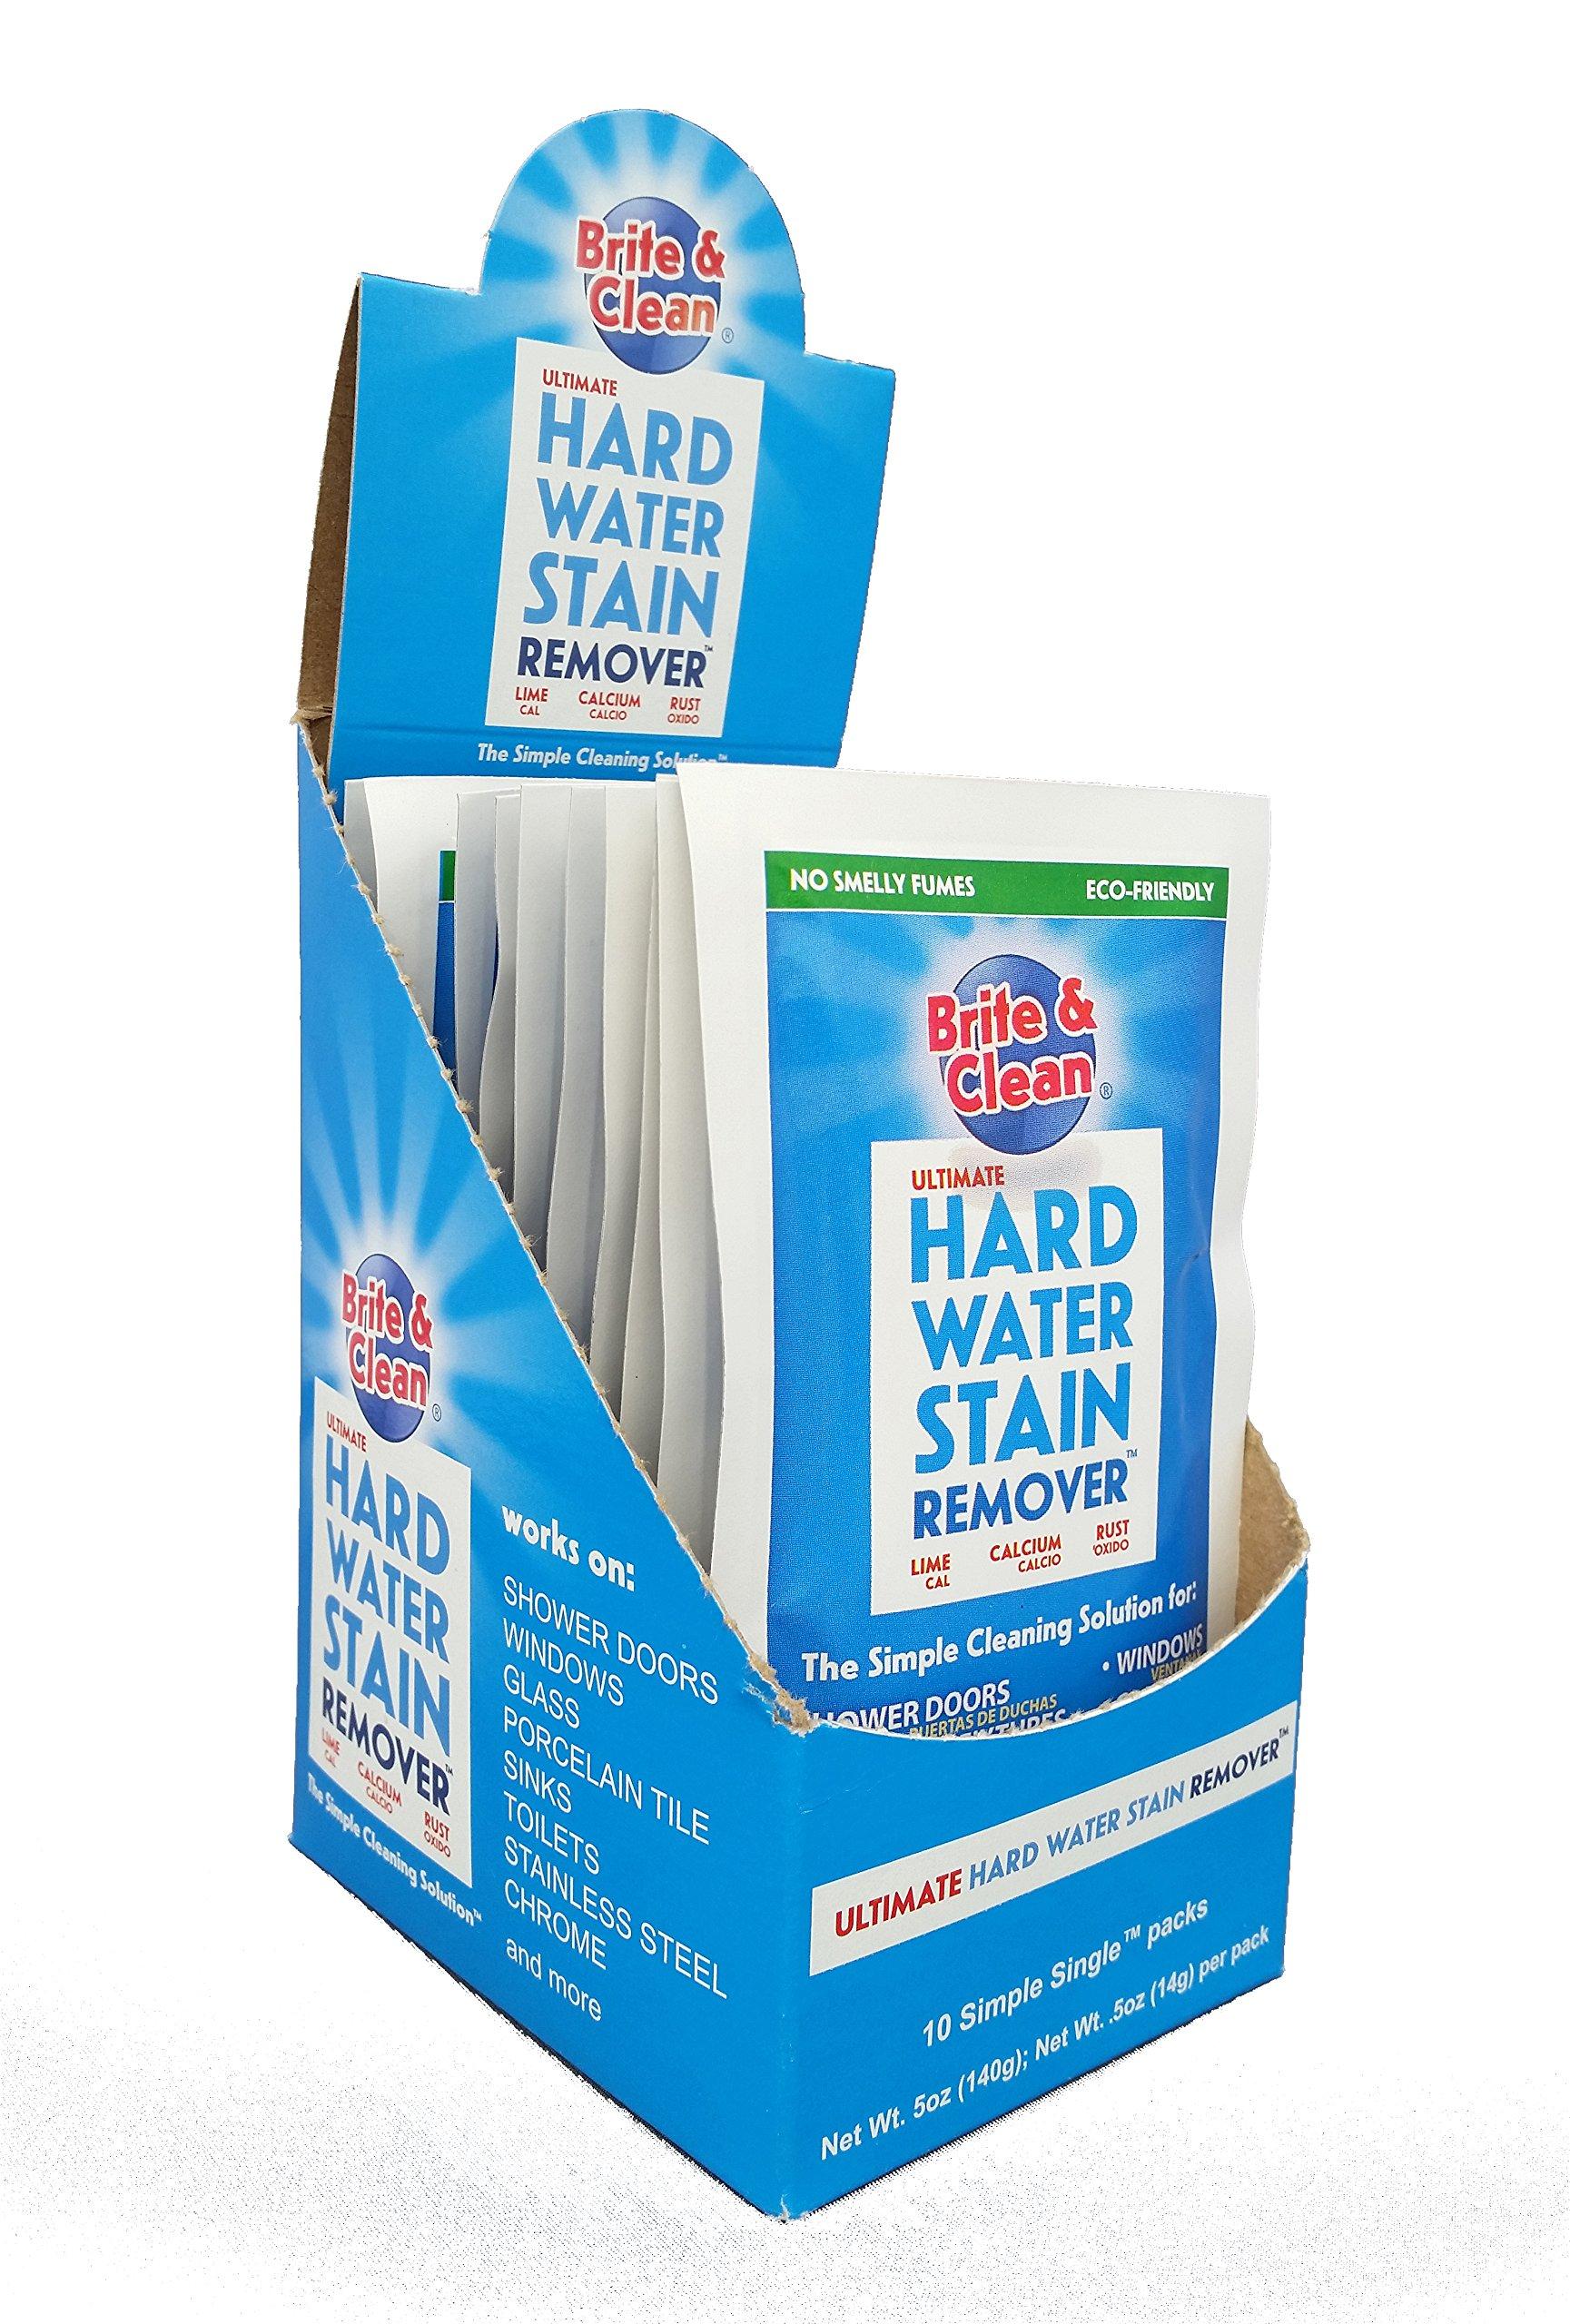 Amazon.com: Brite & Clean Ultimate Hard Water Stain Remover: Health ...